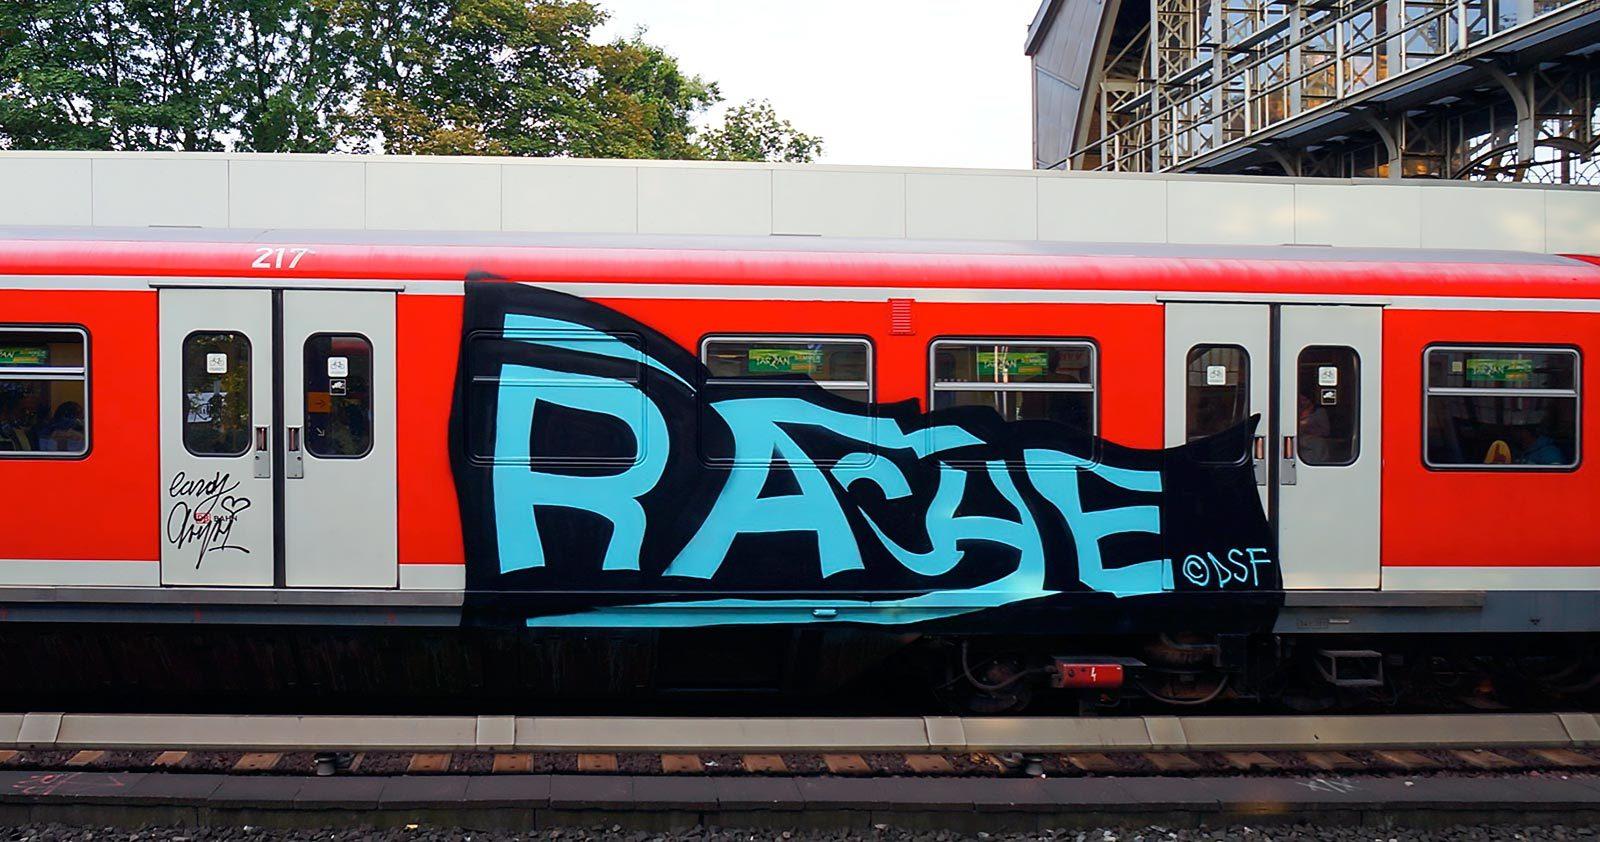 The Art Of Rage: rencontre avec Rache